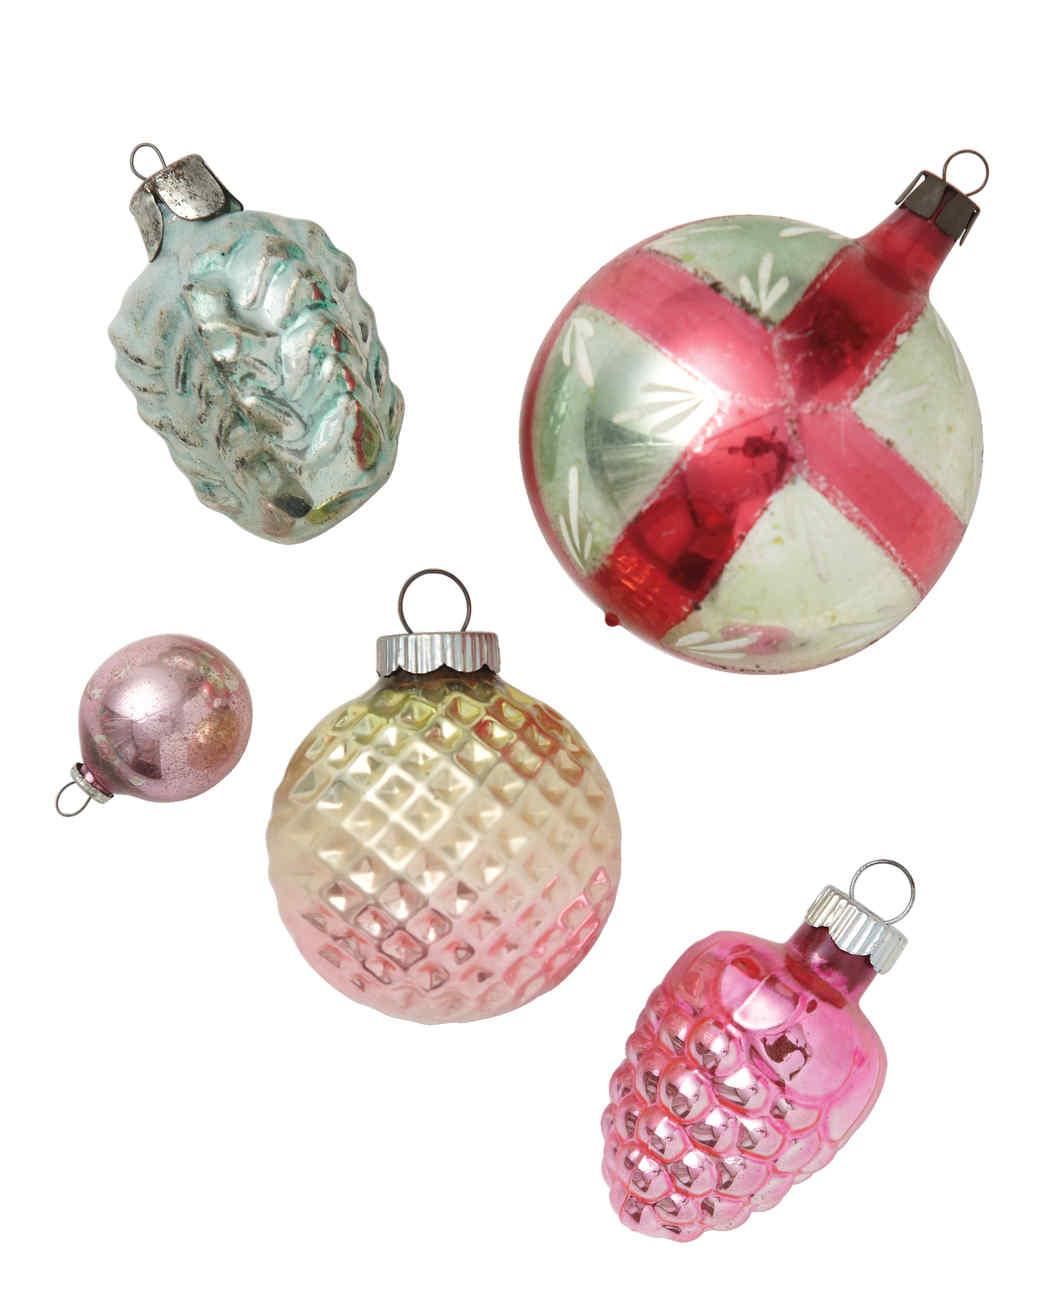 ornaments-132-mld110571.jpg